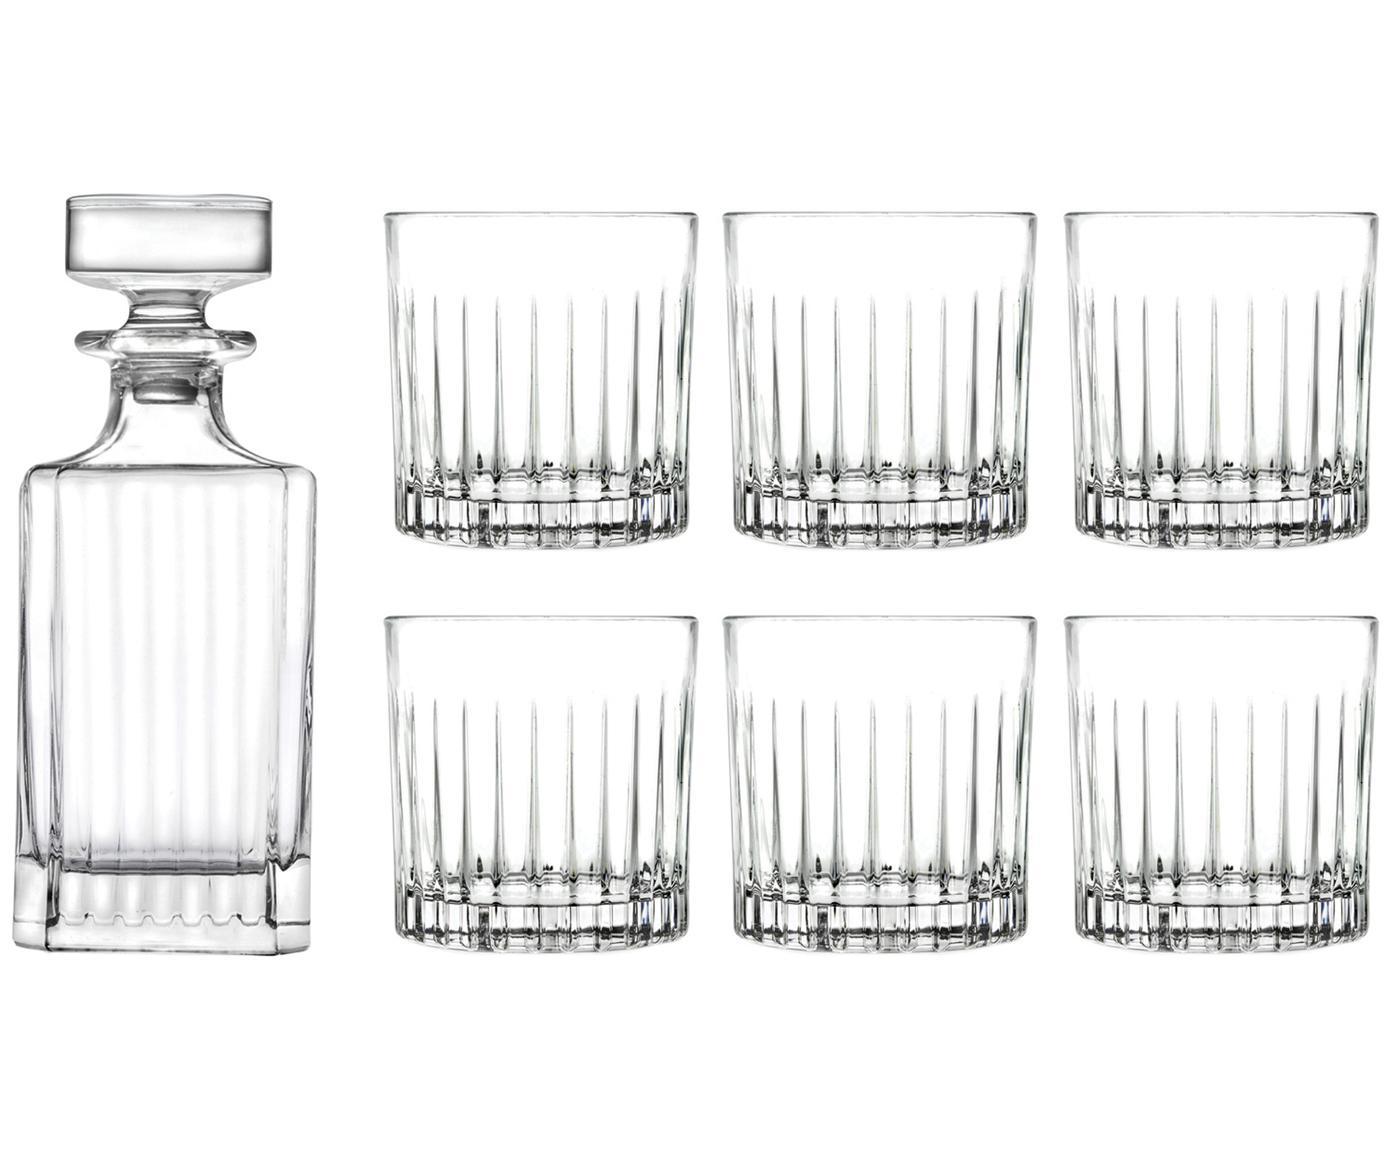 Set de whisky de cristal Timeless, 7pzas., Cristal, Transparente, Tamaños diferentes